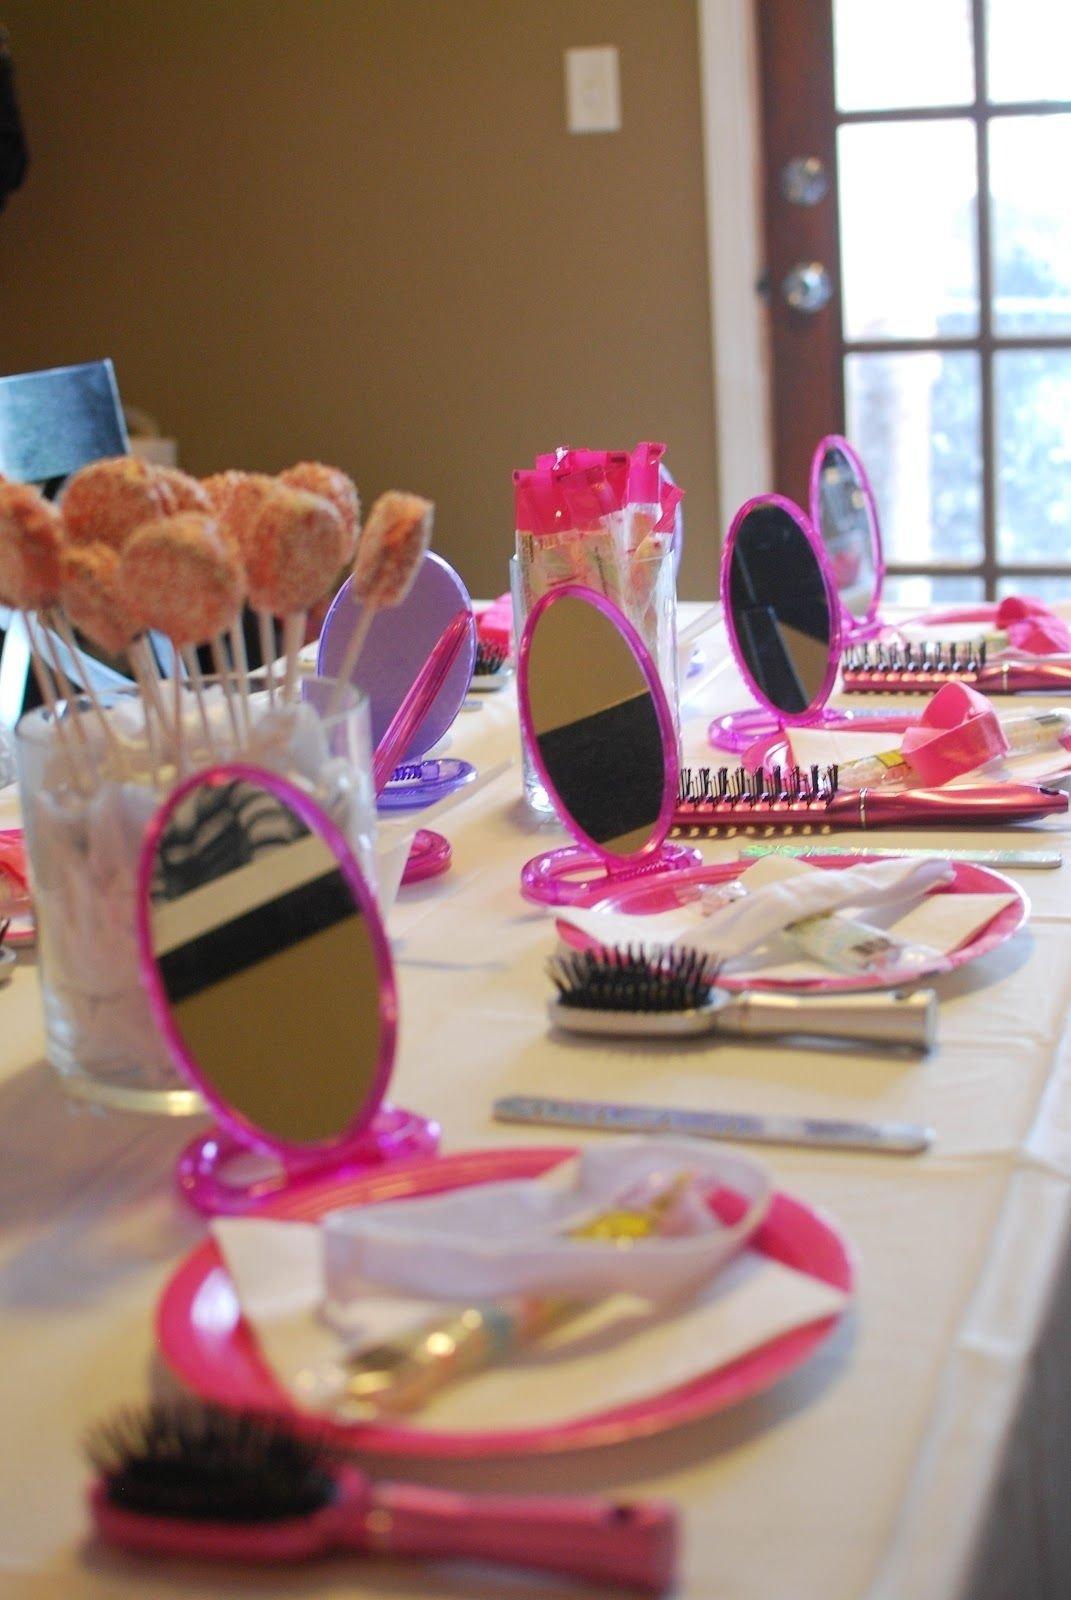 10 Lovable 4 Yr Old Girl Birthday Party Ideas spa party ideas for 8 yr old girls remember this for the twins via 2020